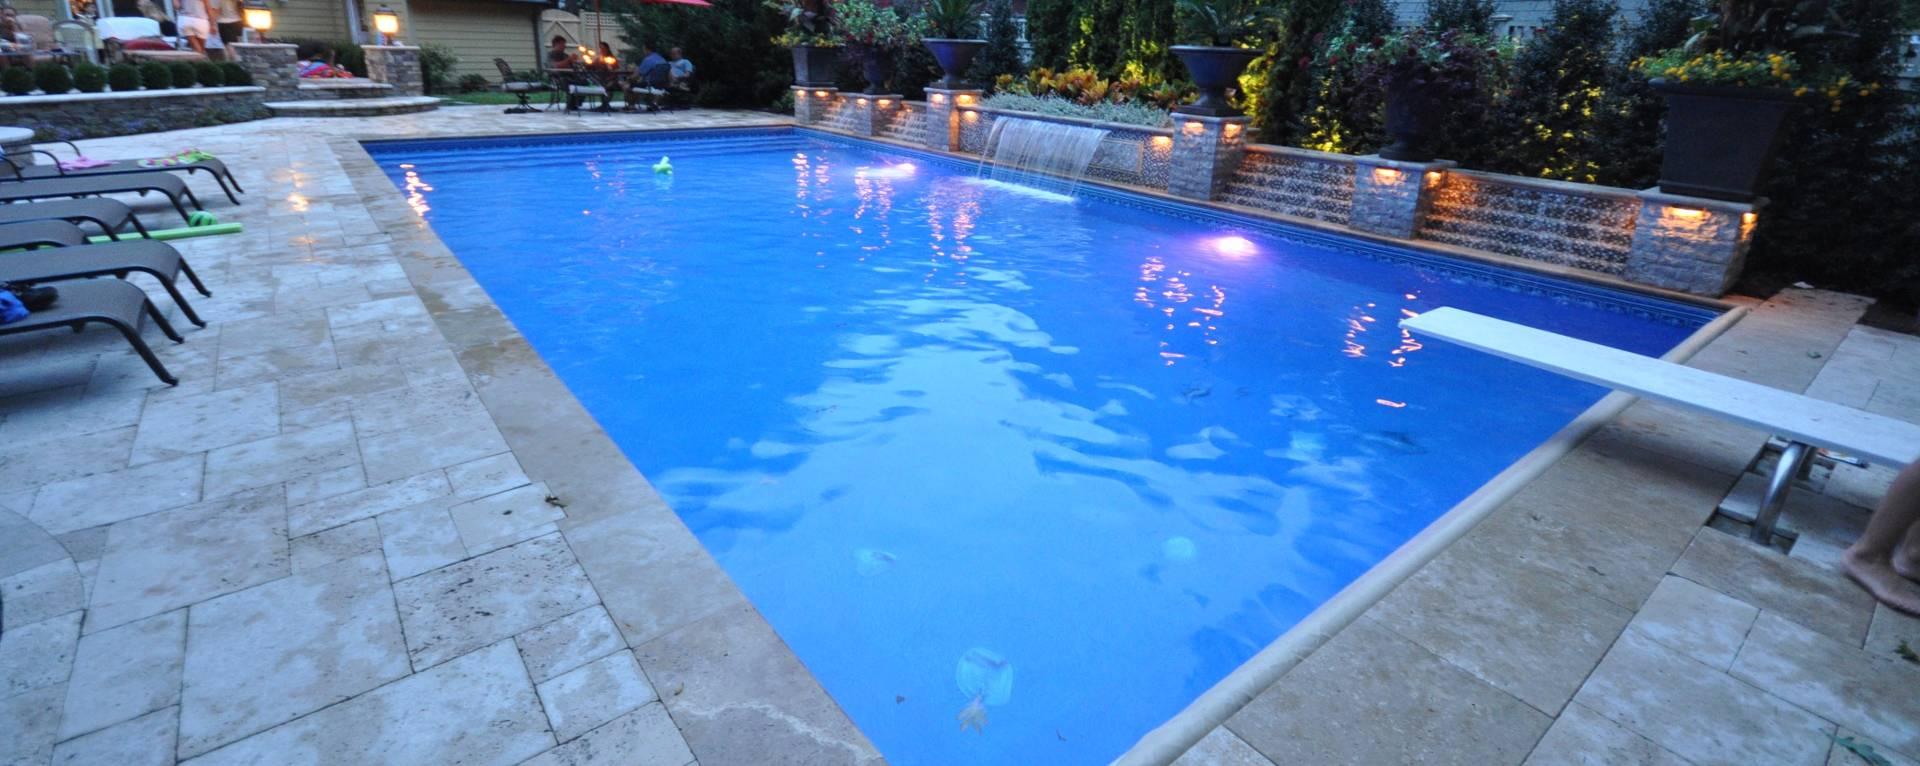 Long Island Swimming Pools  Inground Pools  Custom Pools  Gappsi